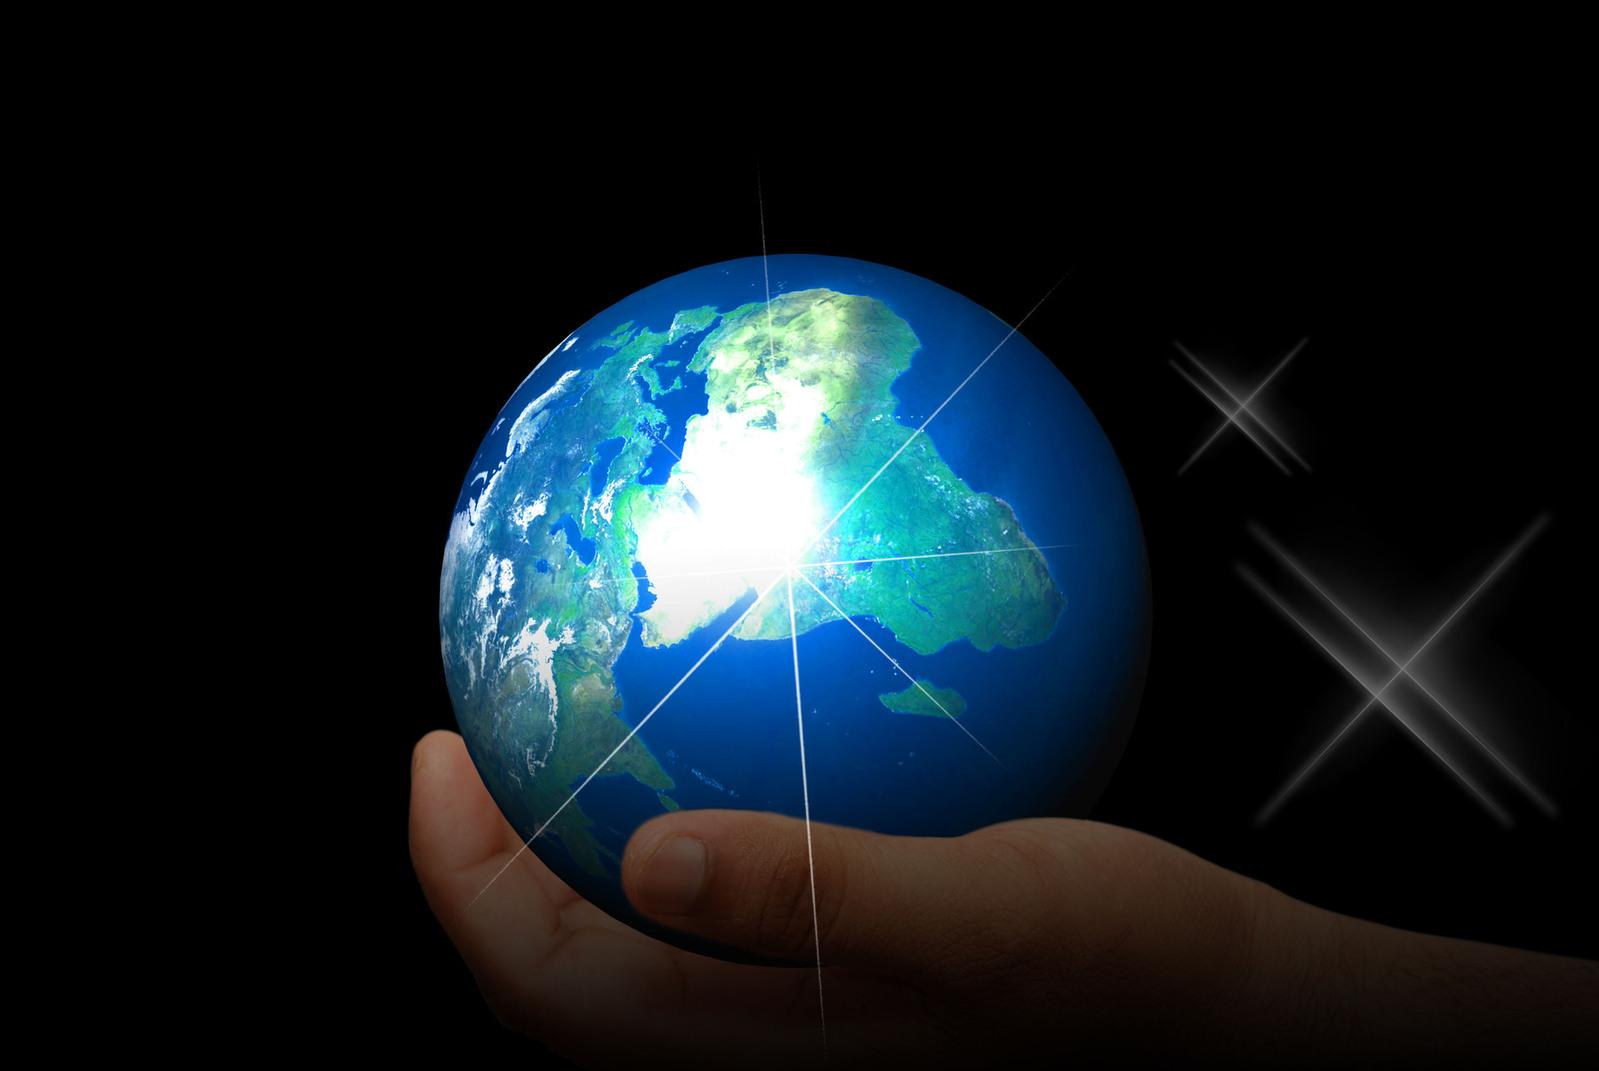 holding-earth-1242108-1599x1070.jpg